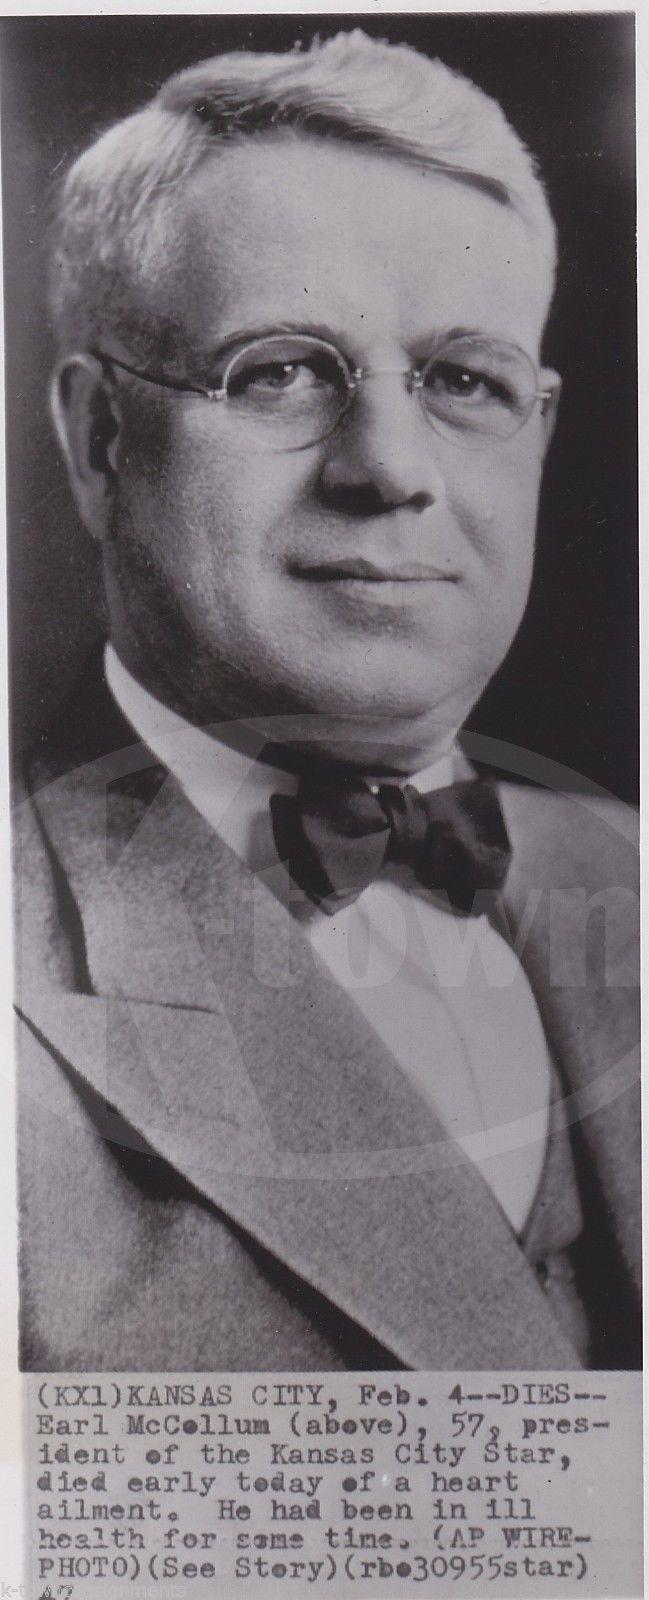 EARL McCOLLUM KANSAS CITY STAR NEWSPAPER PRESIDENT VINTAGE NEWS PRESS PHOTO 1947